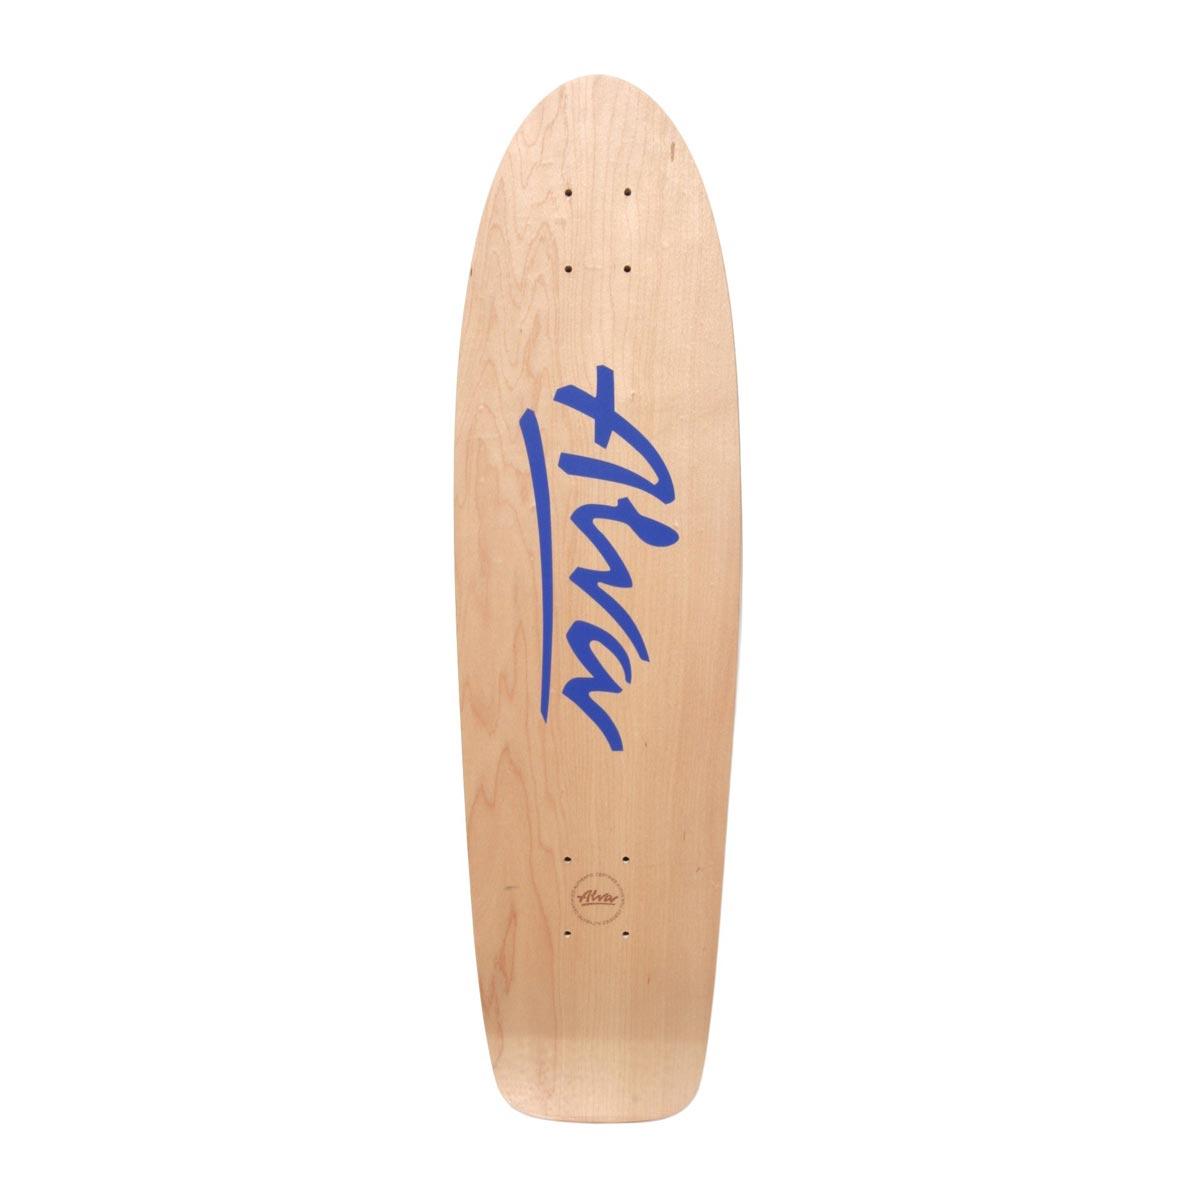 Dogtown Skateboards Canada Online Sales Pickup Vancouver